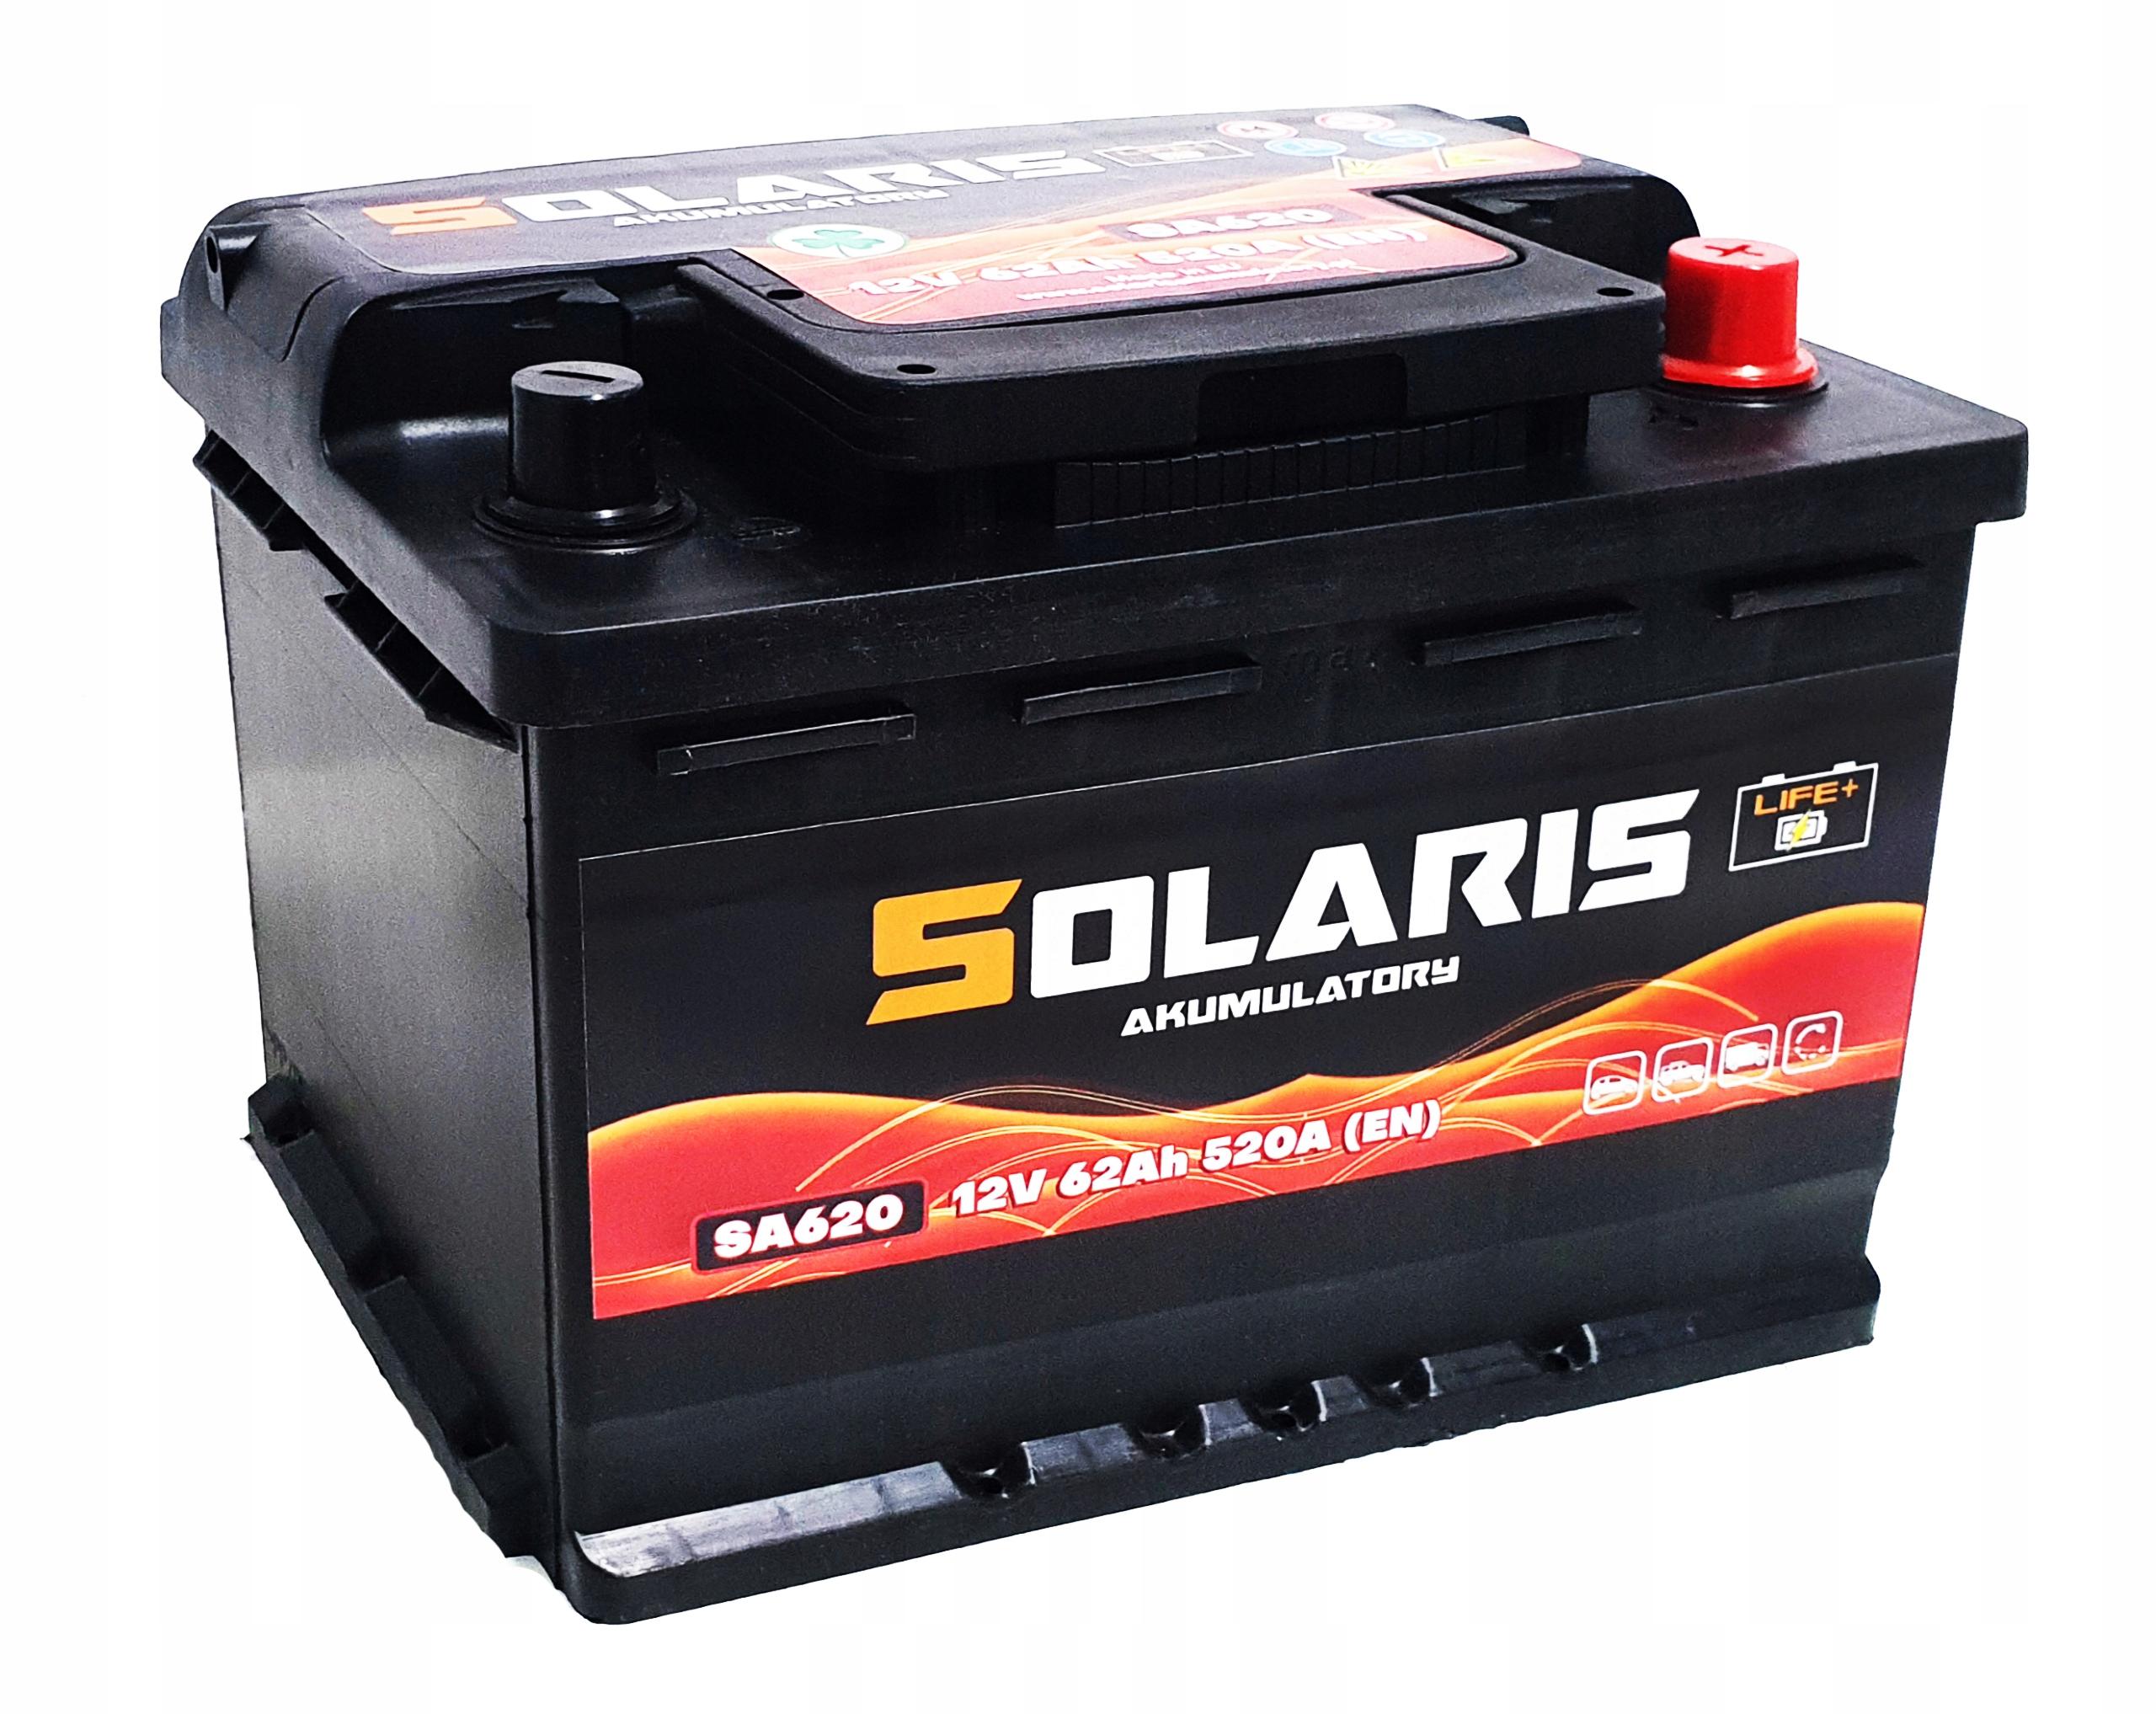 аккумулятор solaris 62ah 520a они 60 620